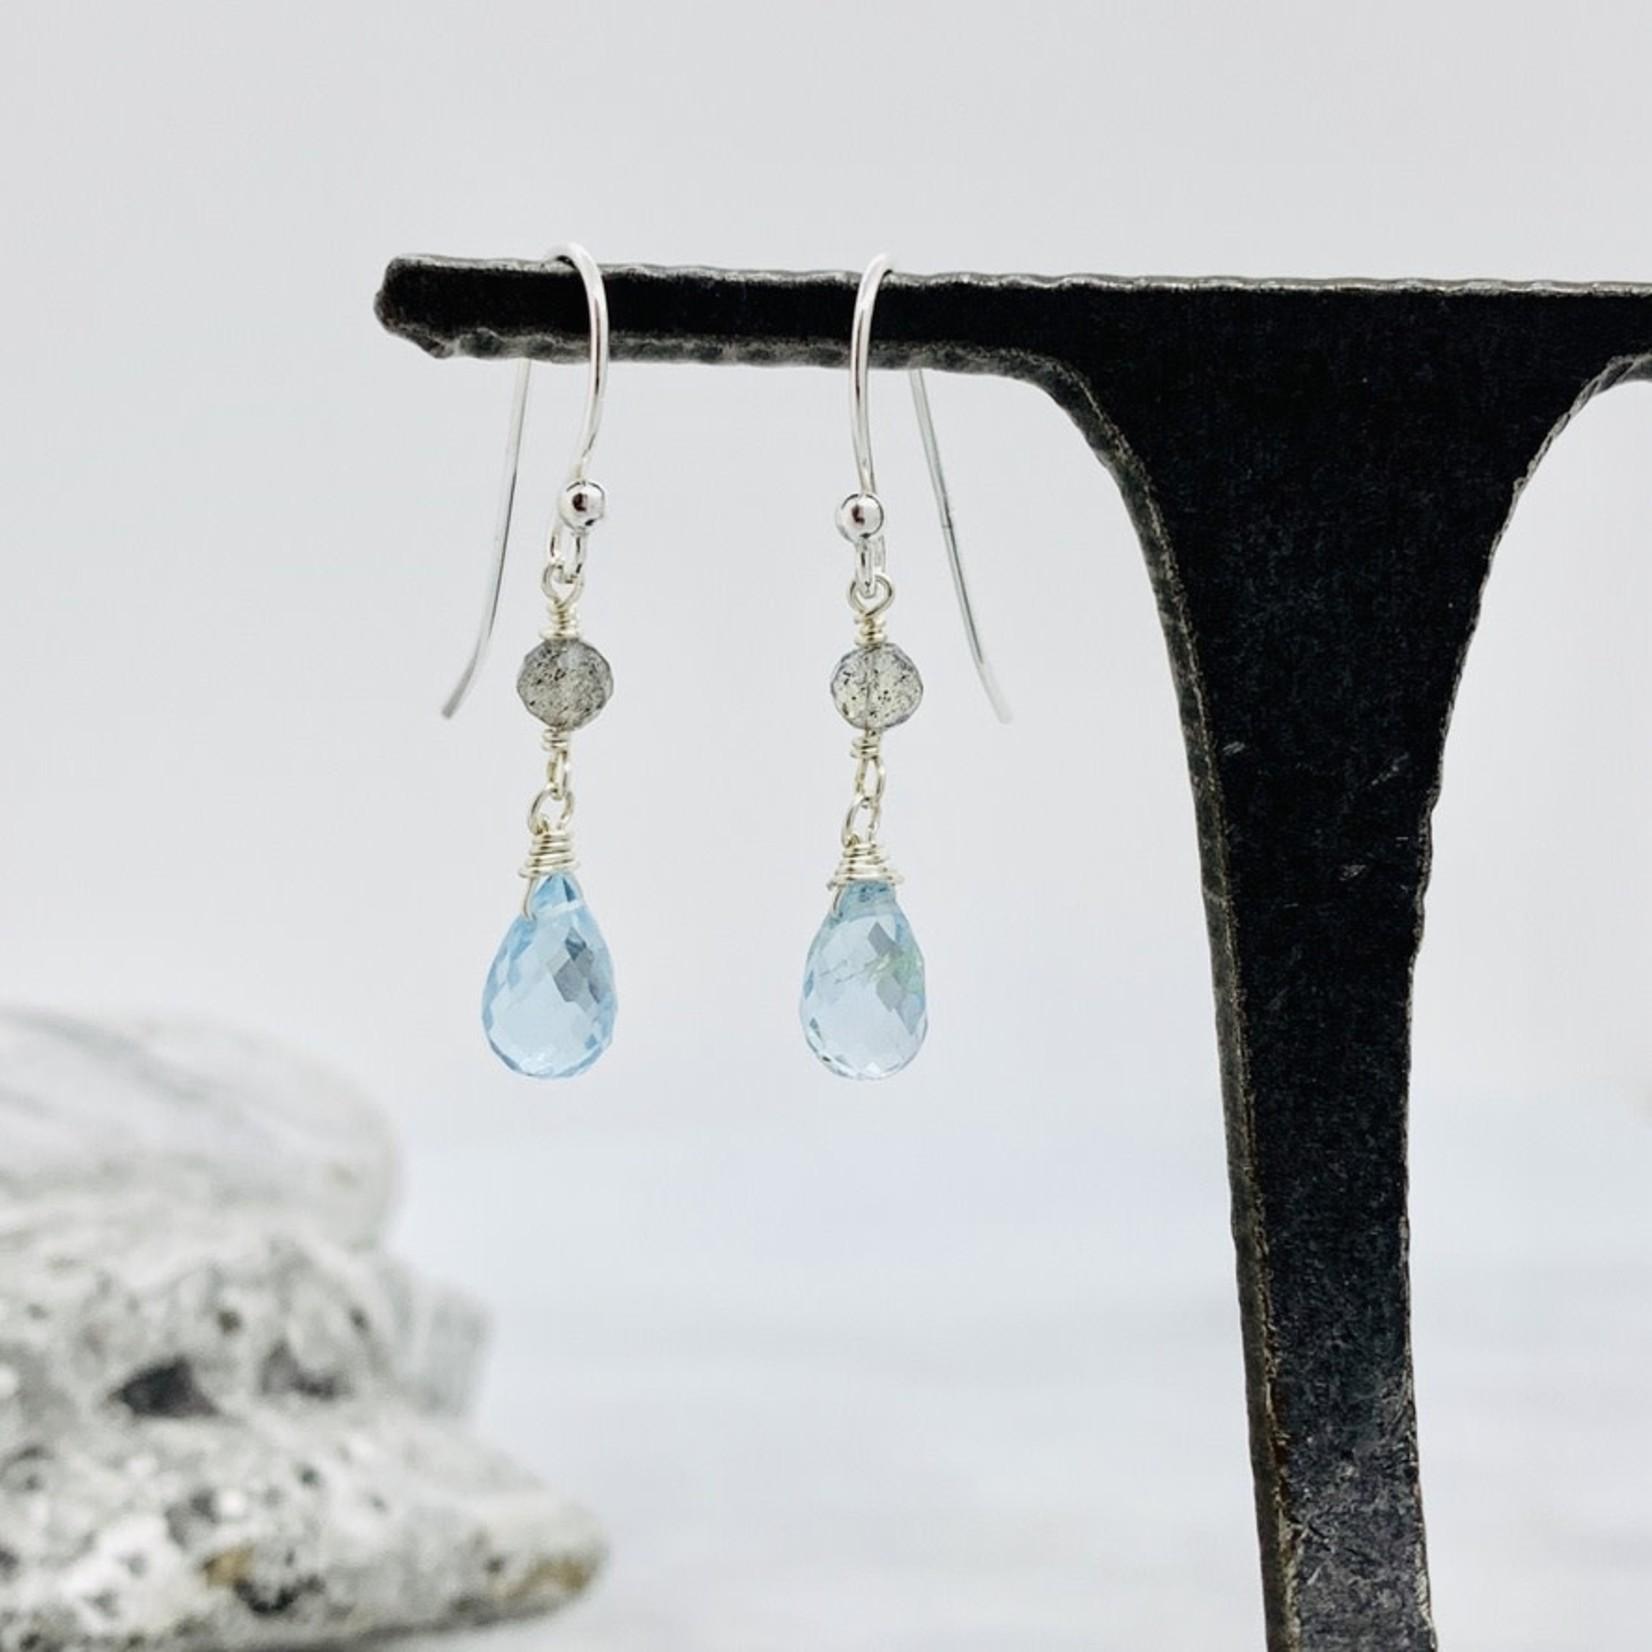 Handmade earrings with sky blue topaz, labradorite